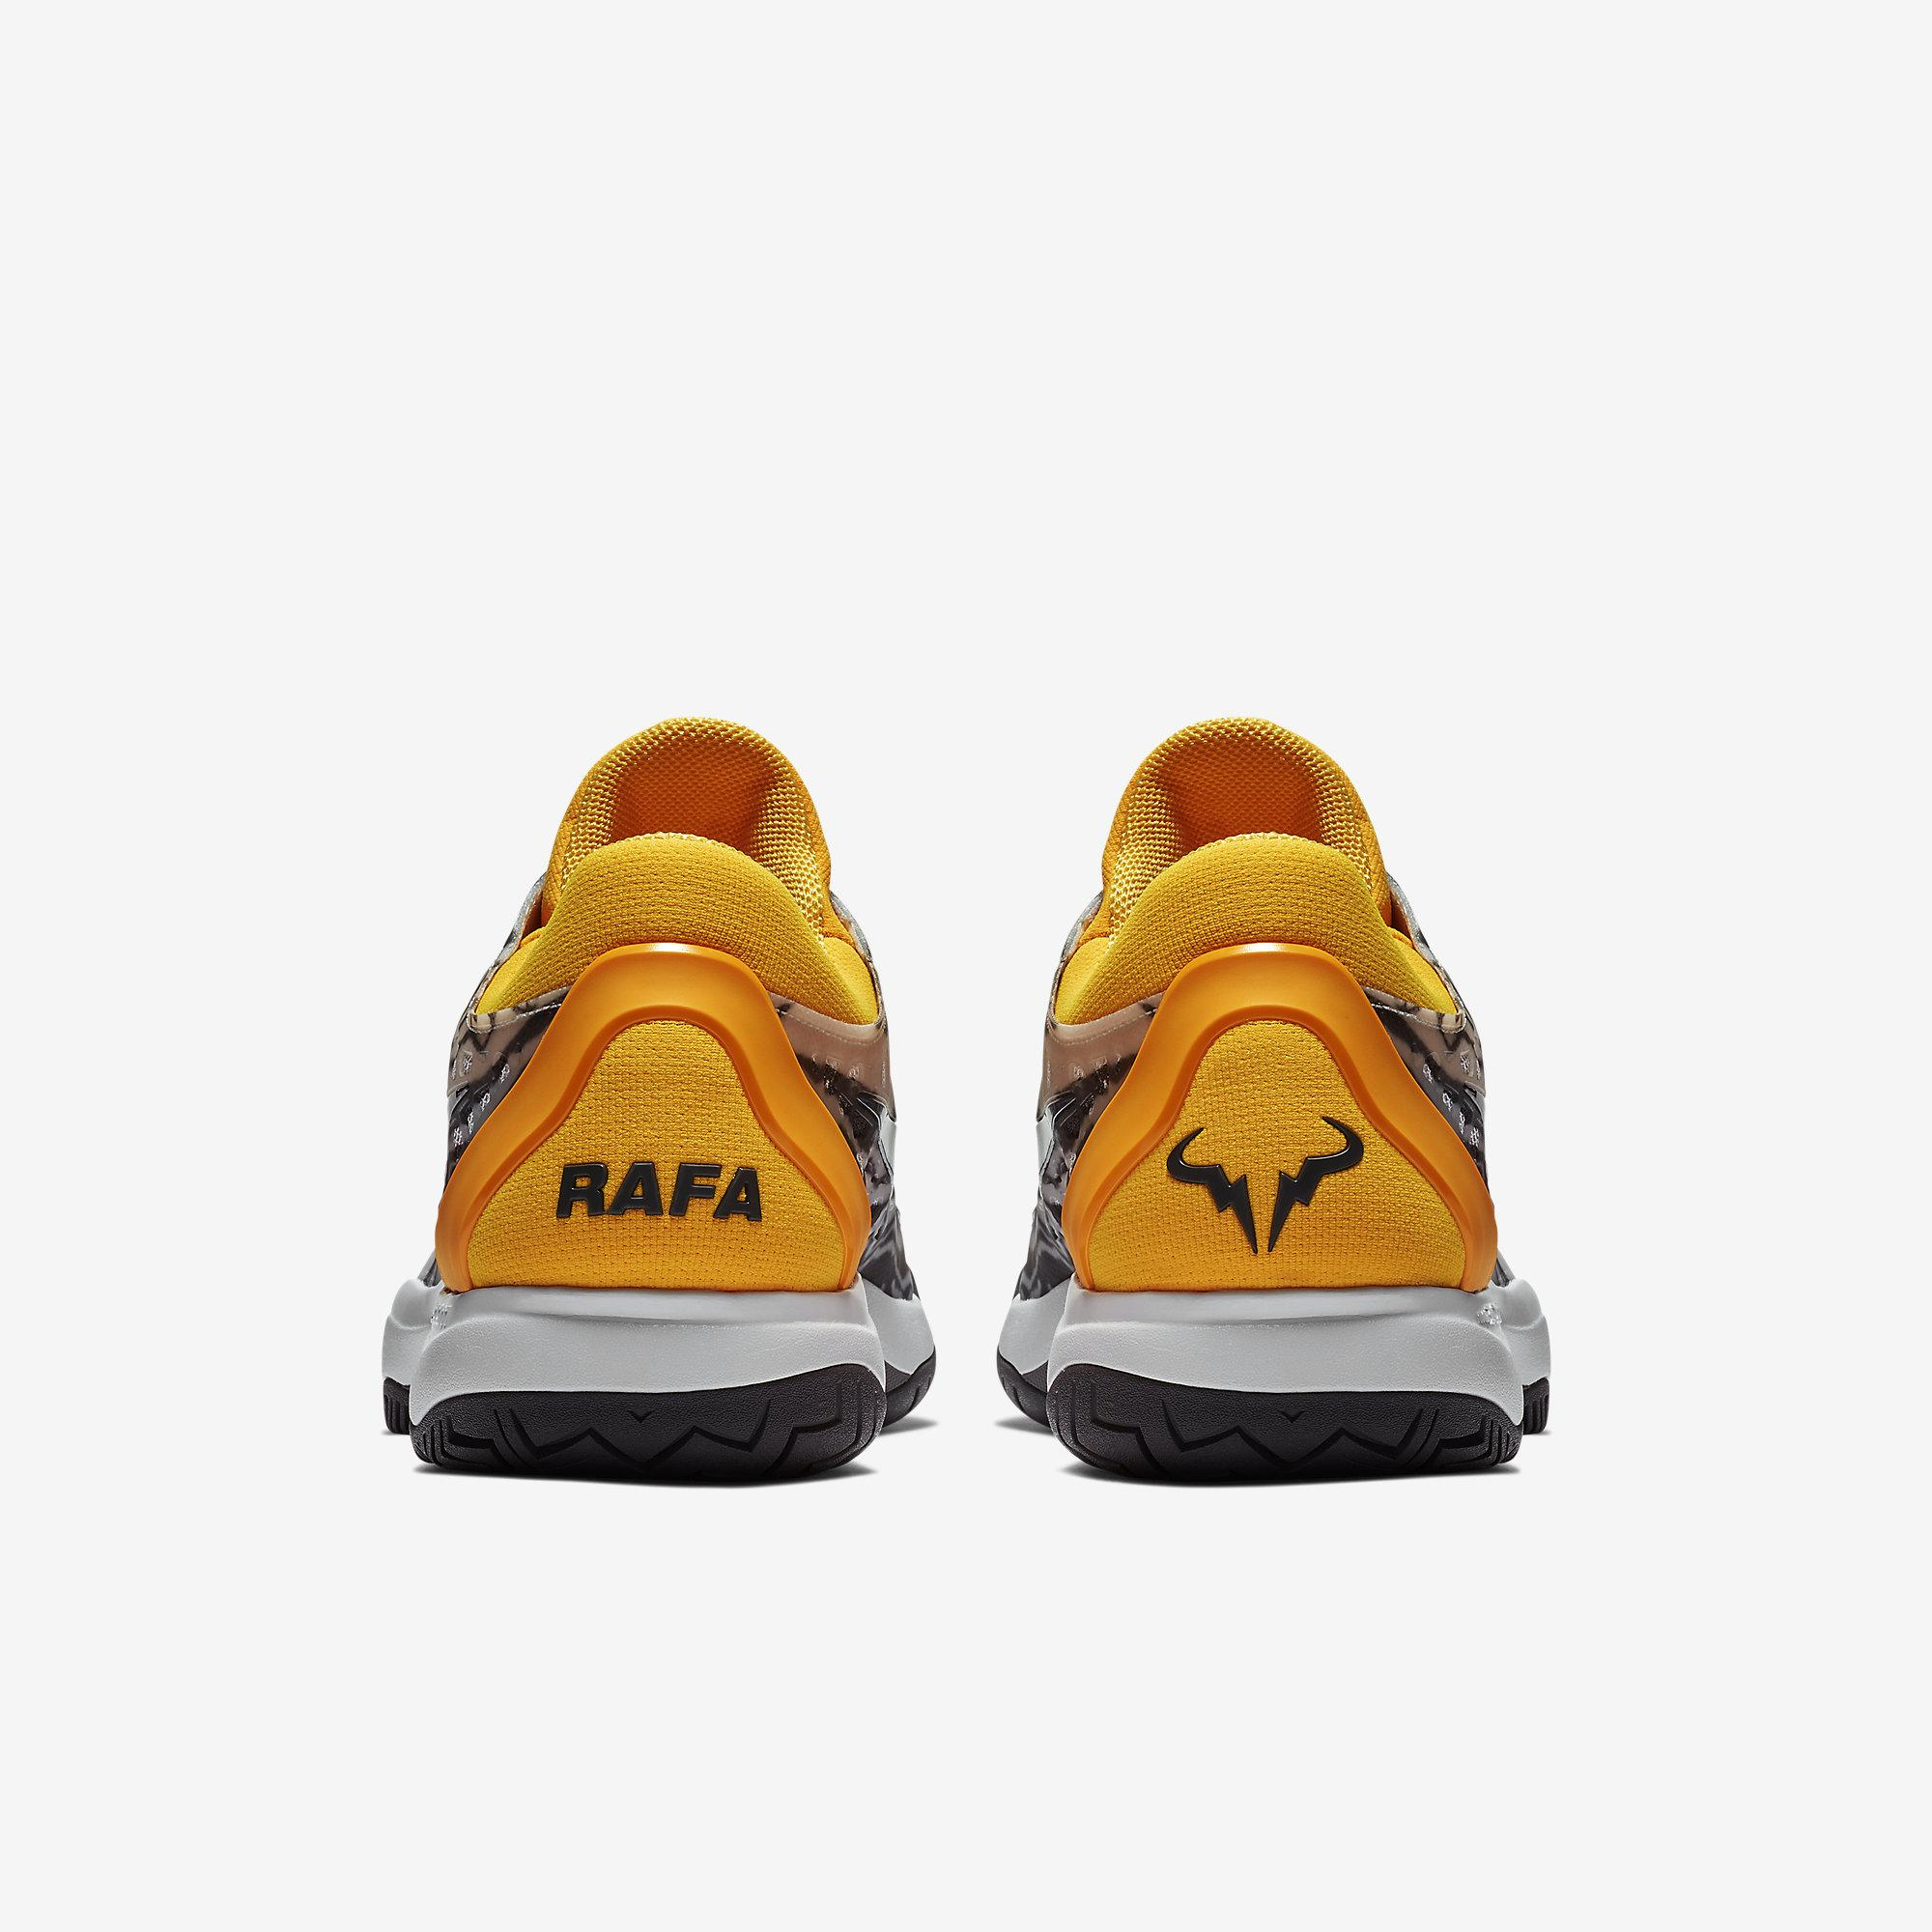 newest b971d 732c1 Nike Mens Zoom Cage 3 Rafa Tennis Shoes - Pure Platinum Laser Orange